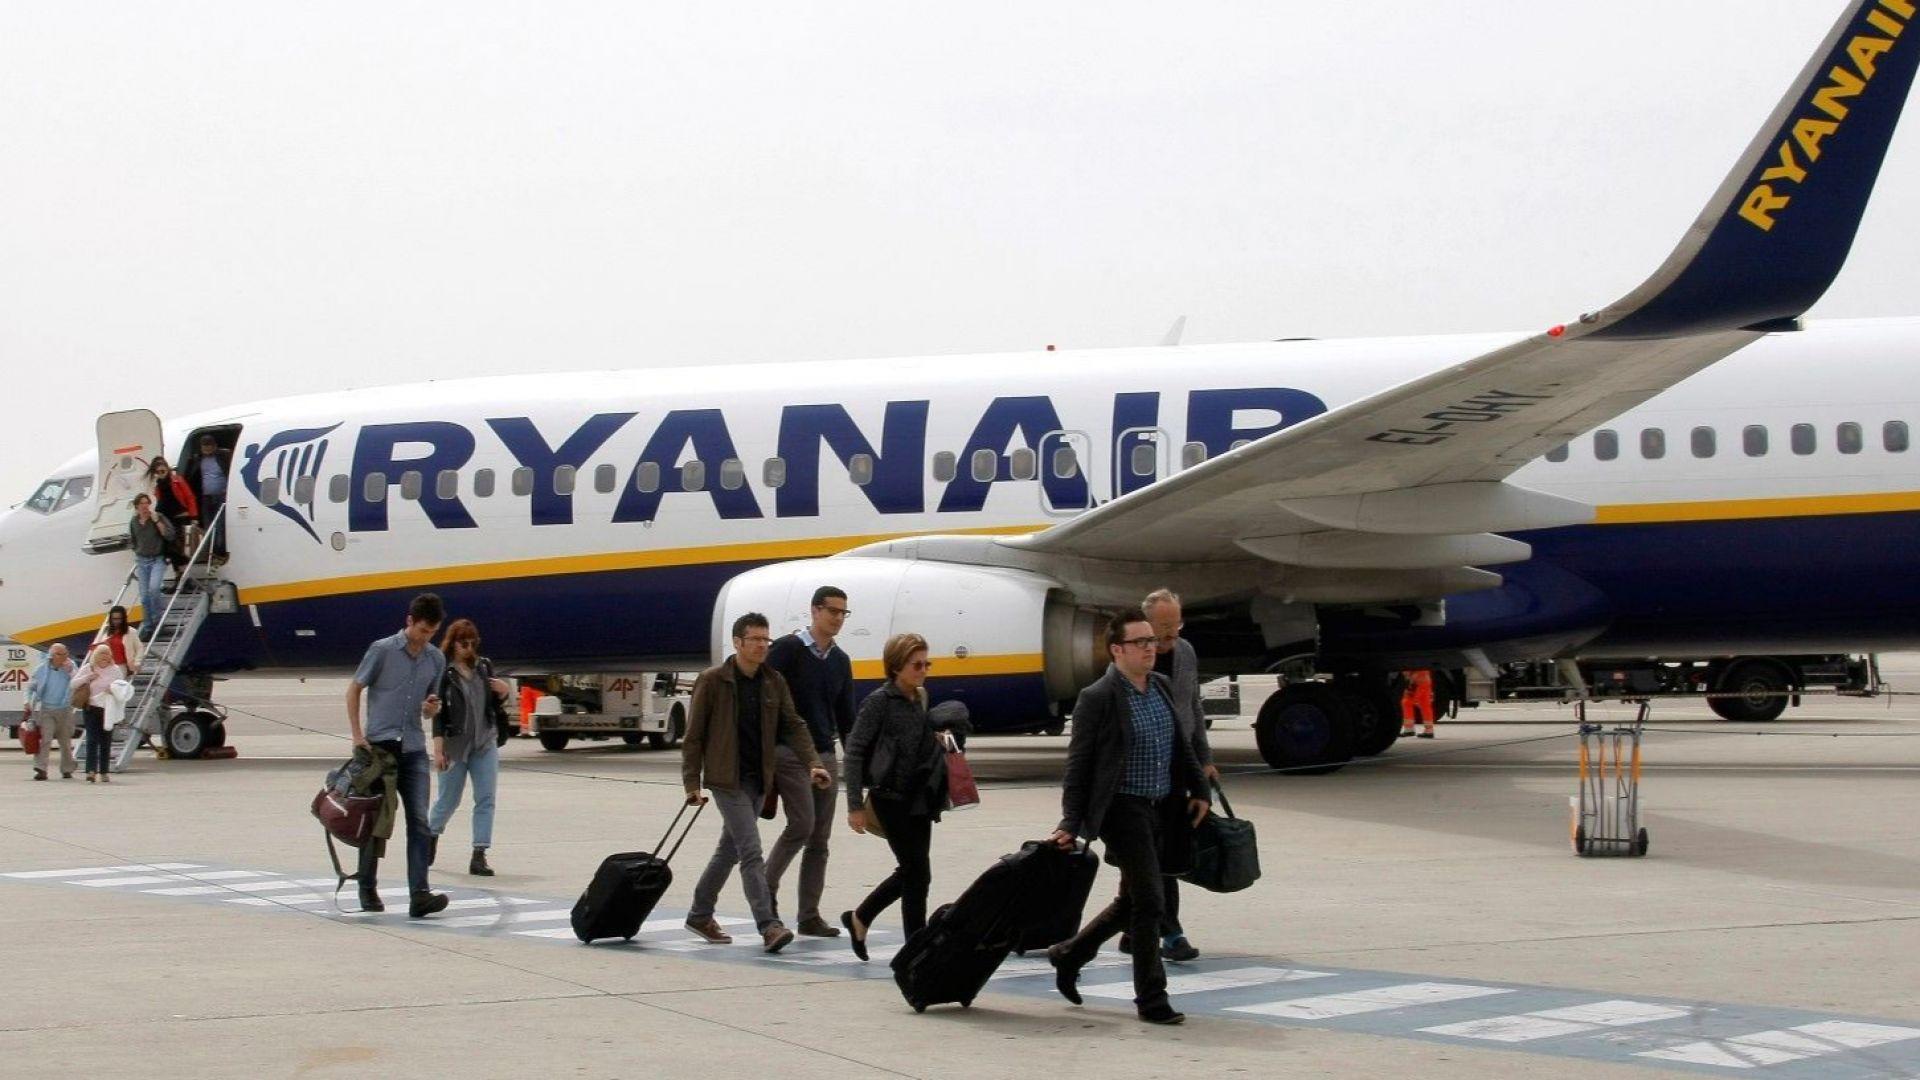 Италиански летища отмениха 700 полета заради стачка